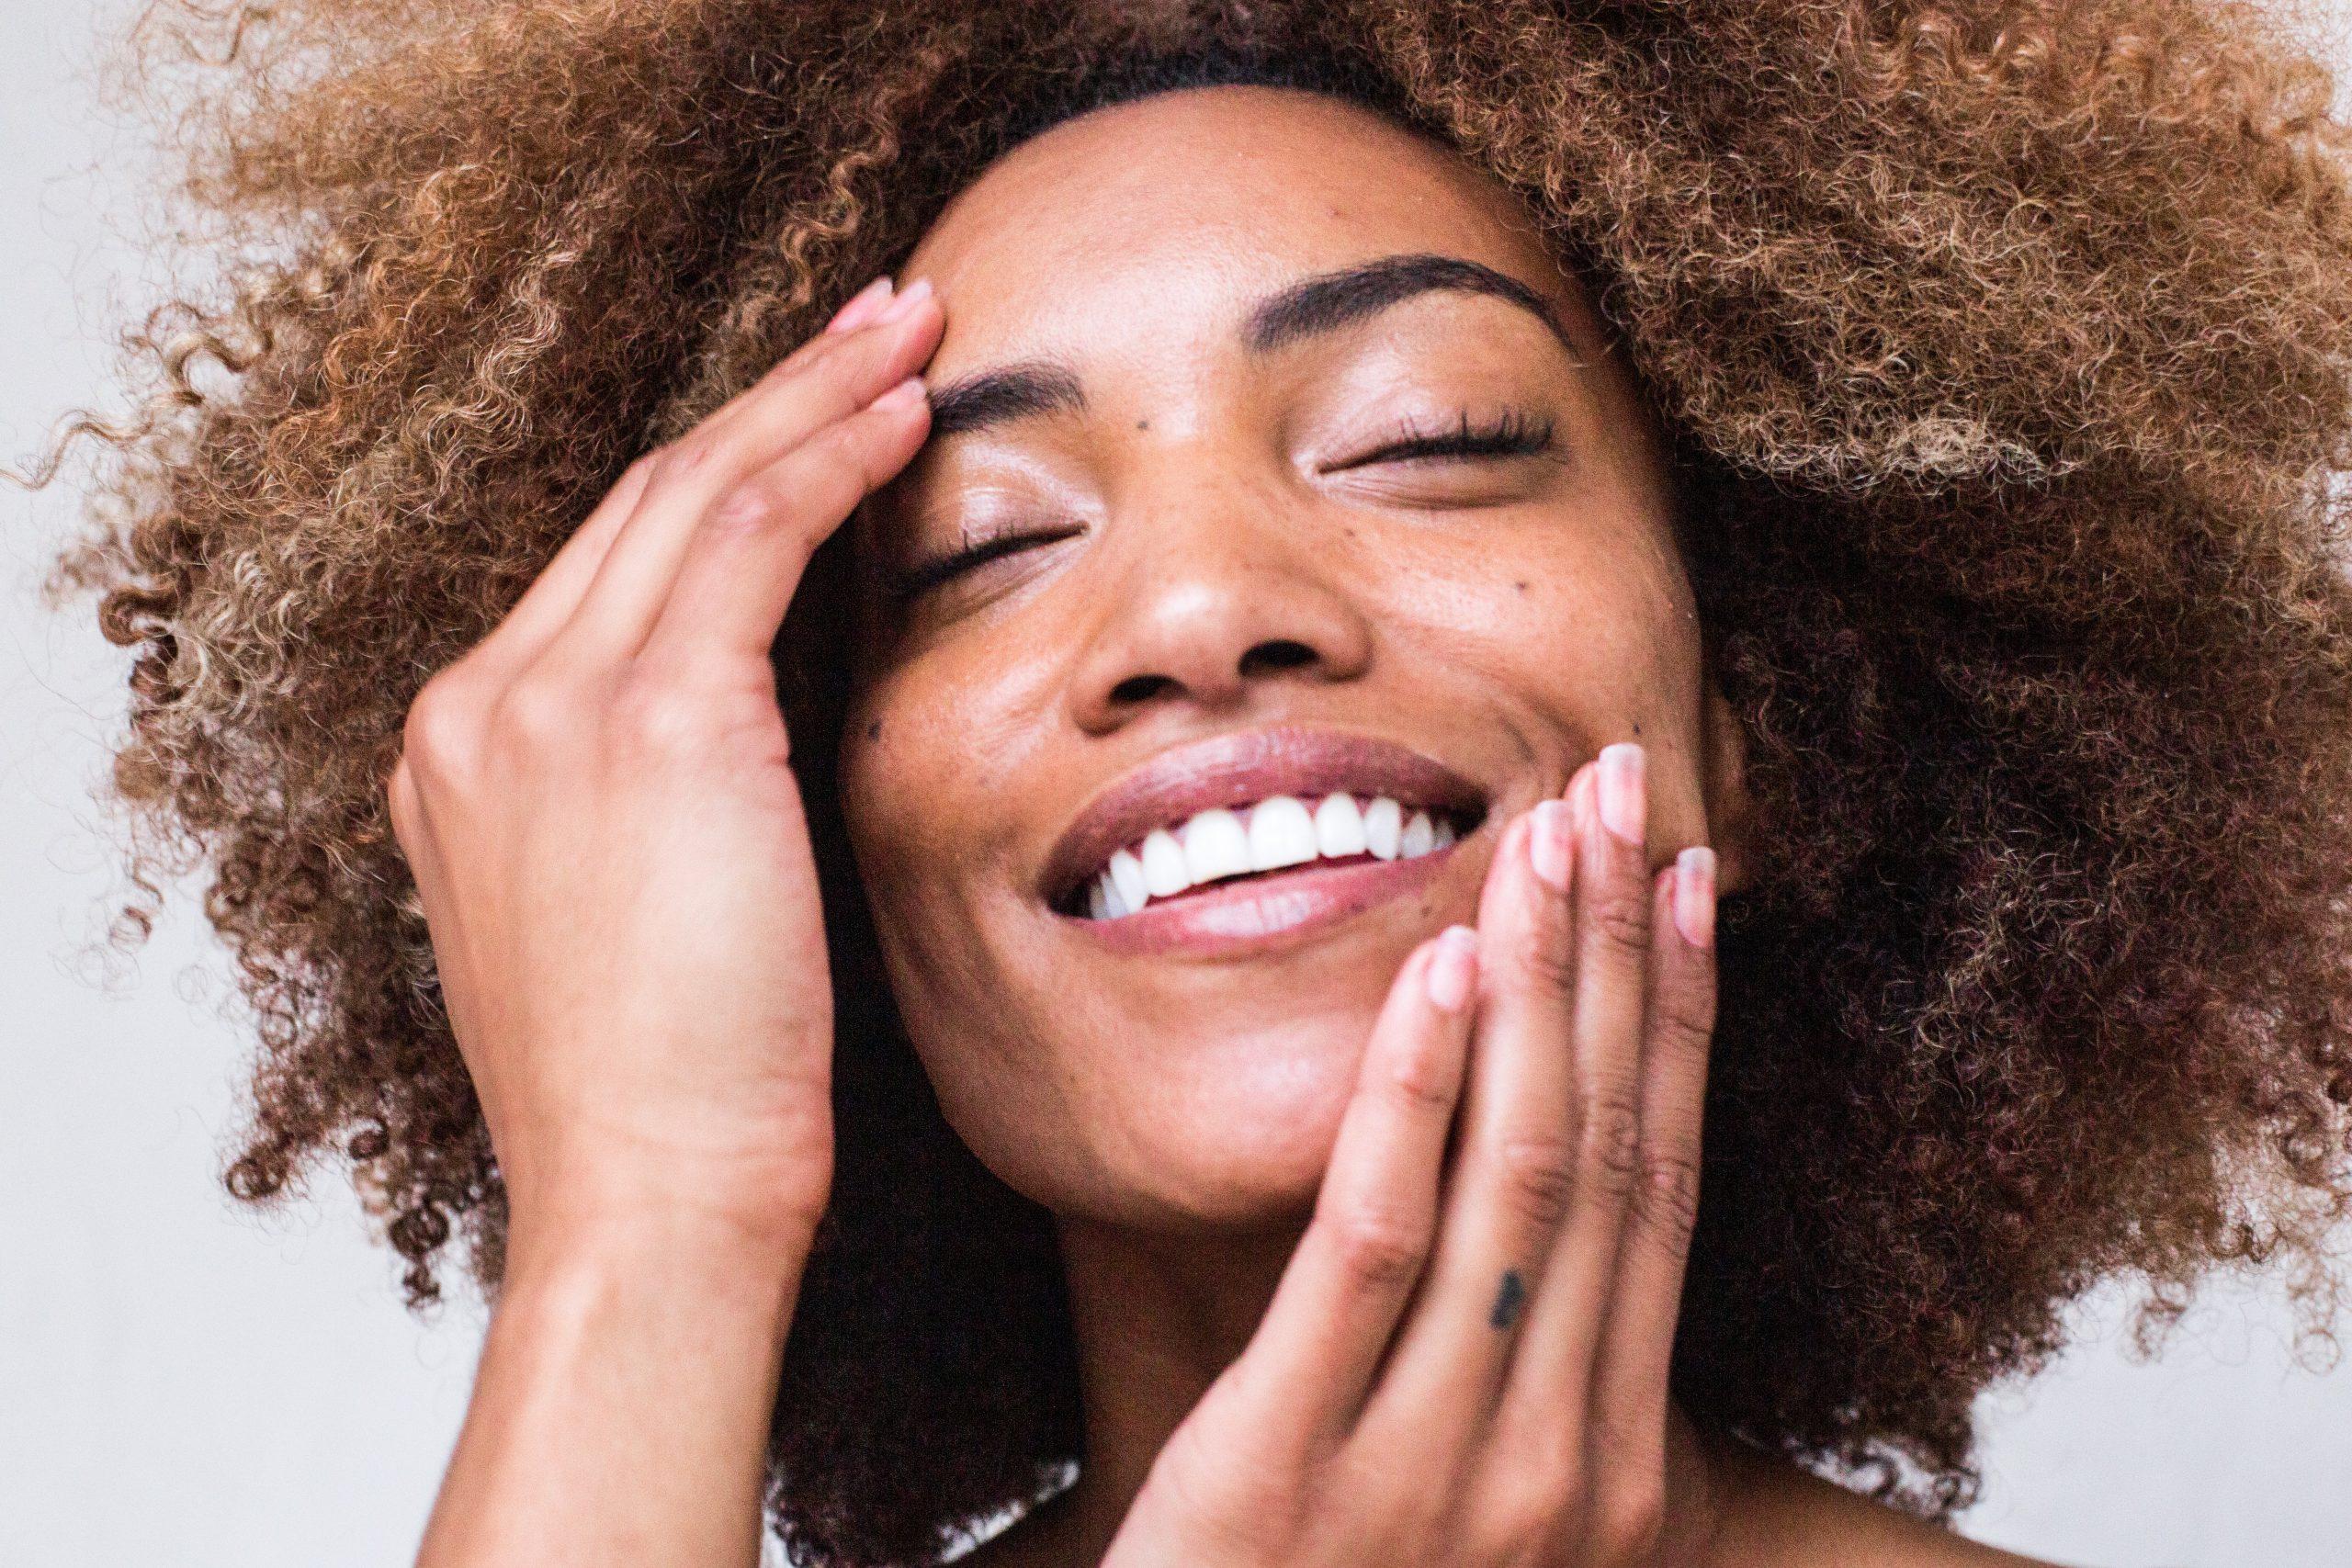 Natural beauty treatments